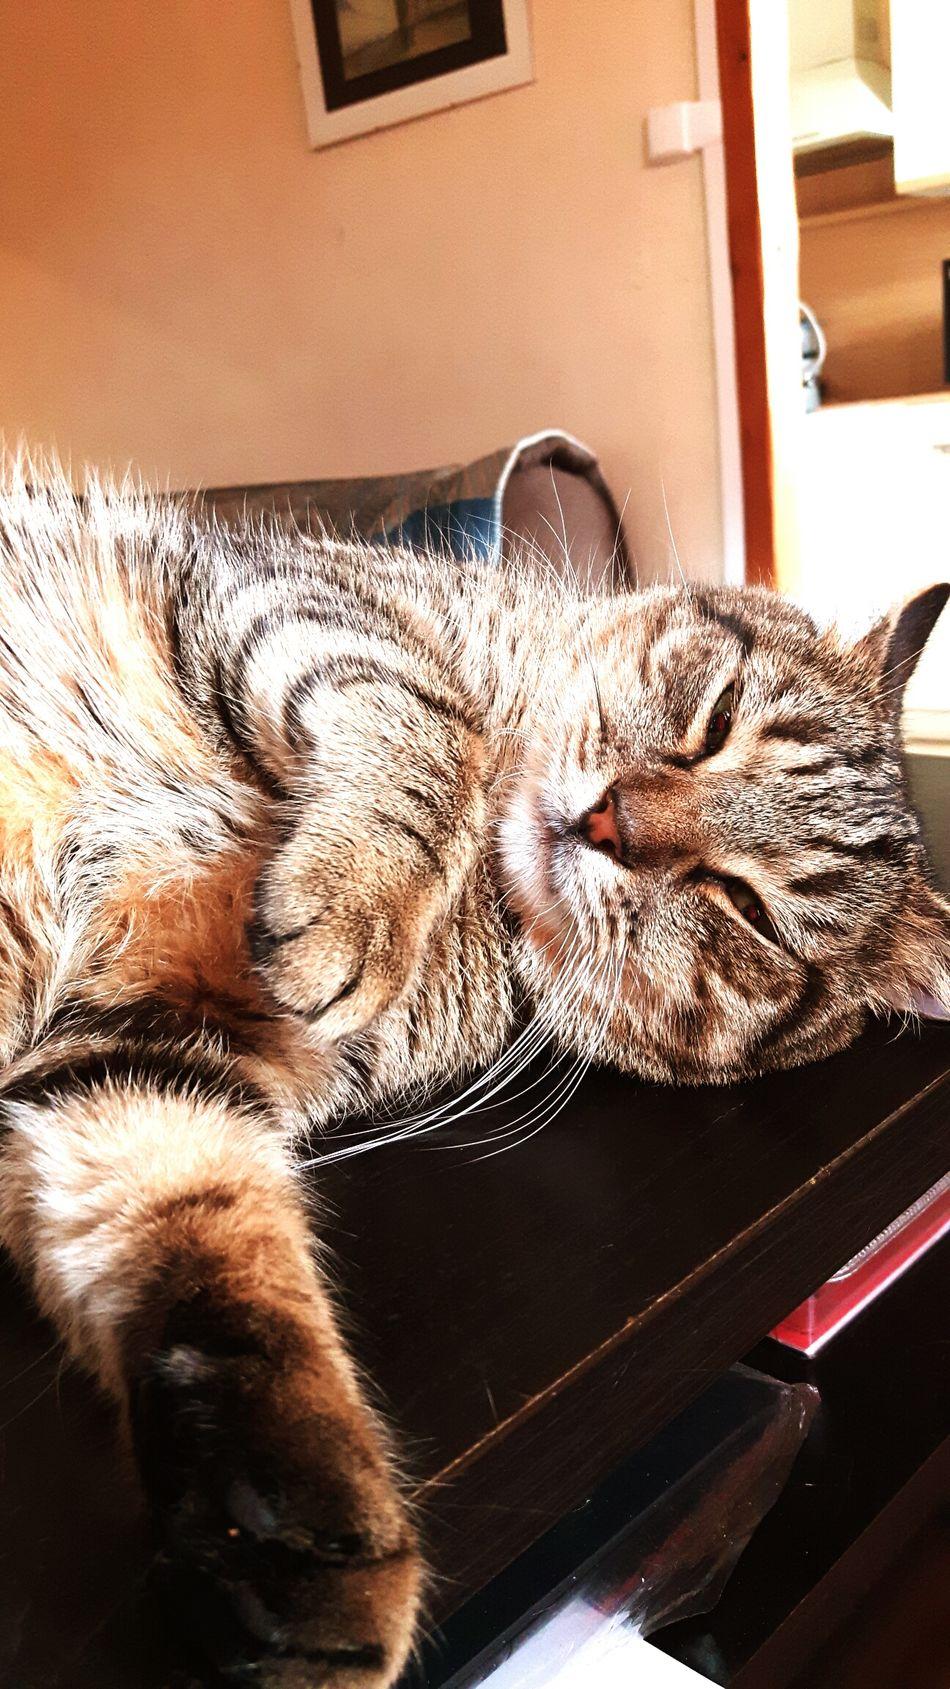 Always Be Cozy :-):-):-) Cat Cat Lovers Cats Of EyeEm Catoftheday EyeEm Gallery Eye4photography  Eyeemphotography